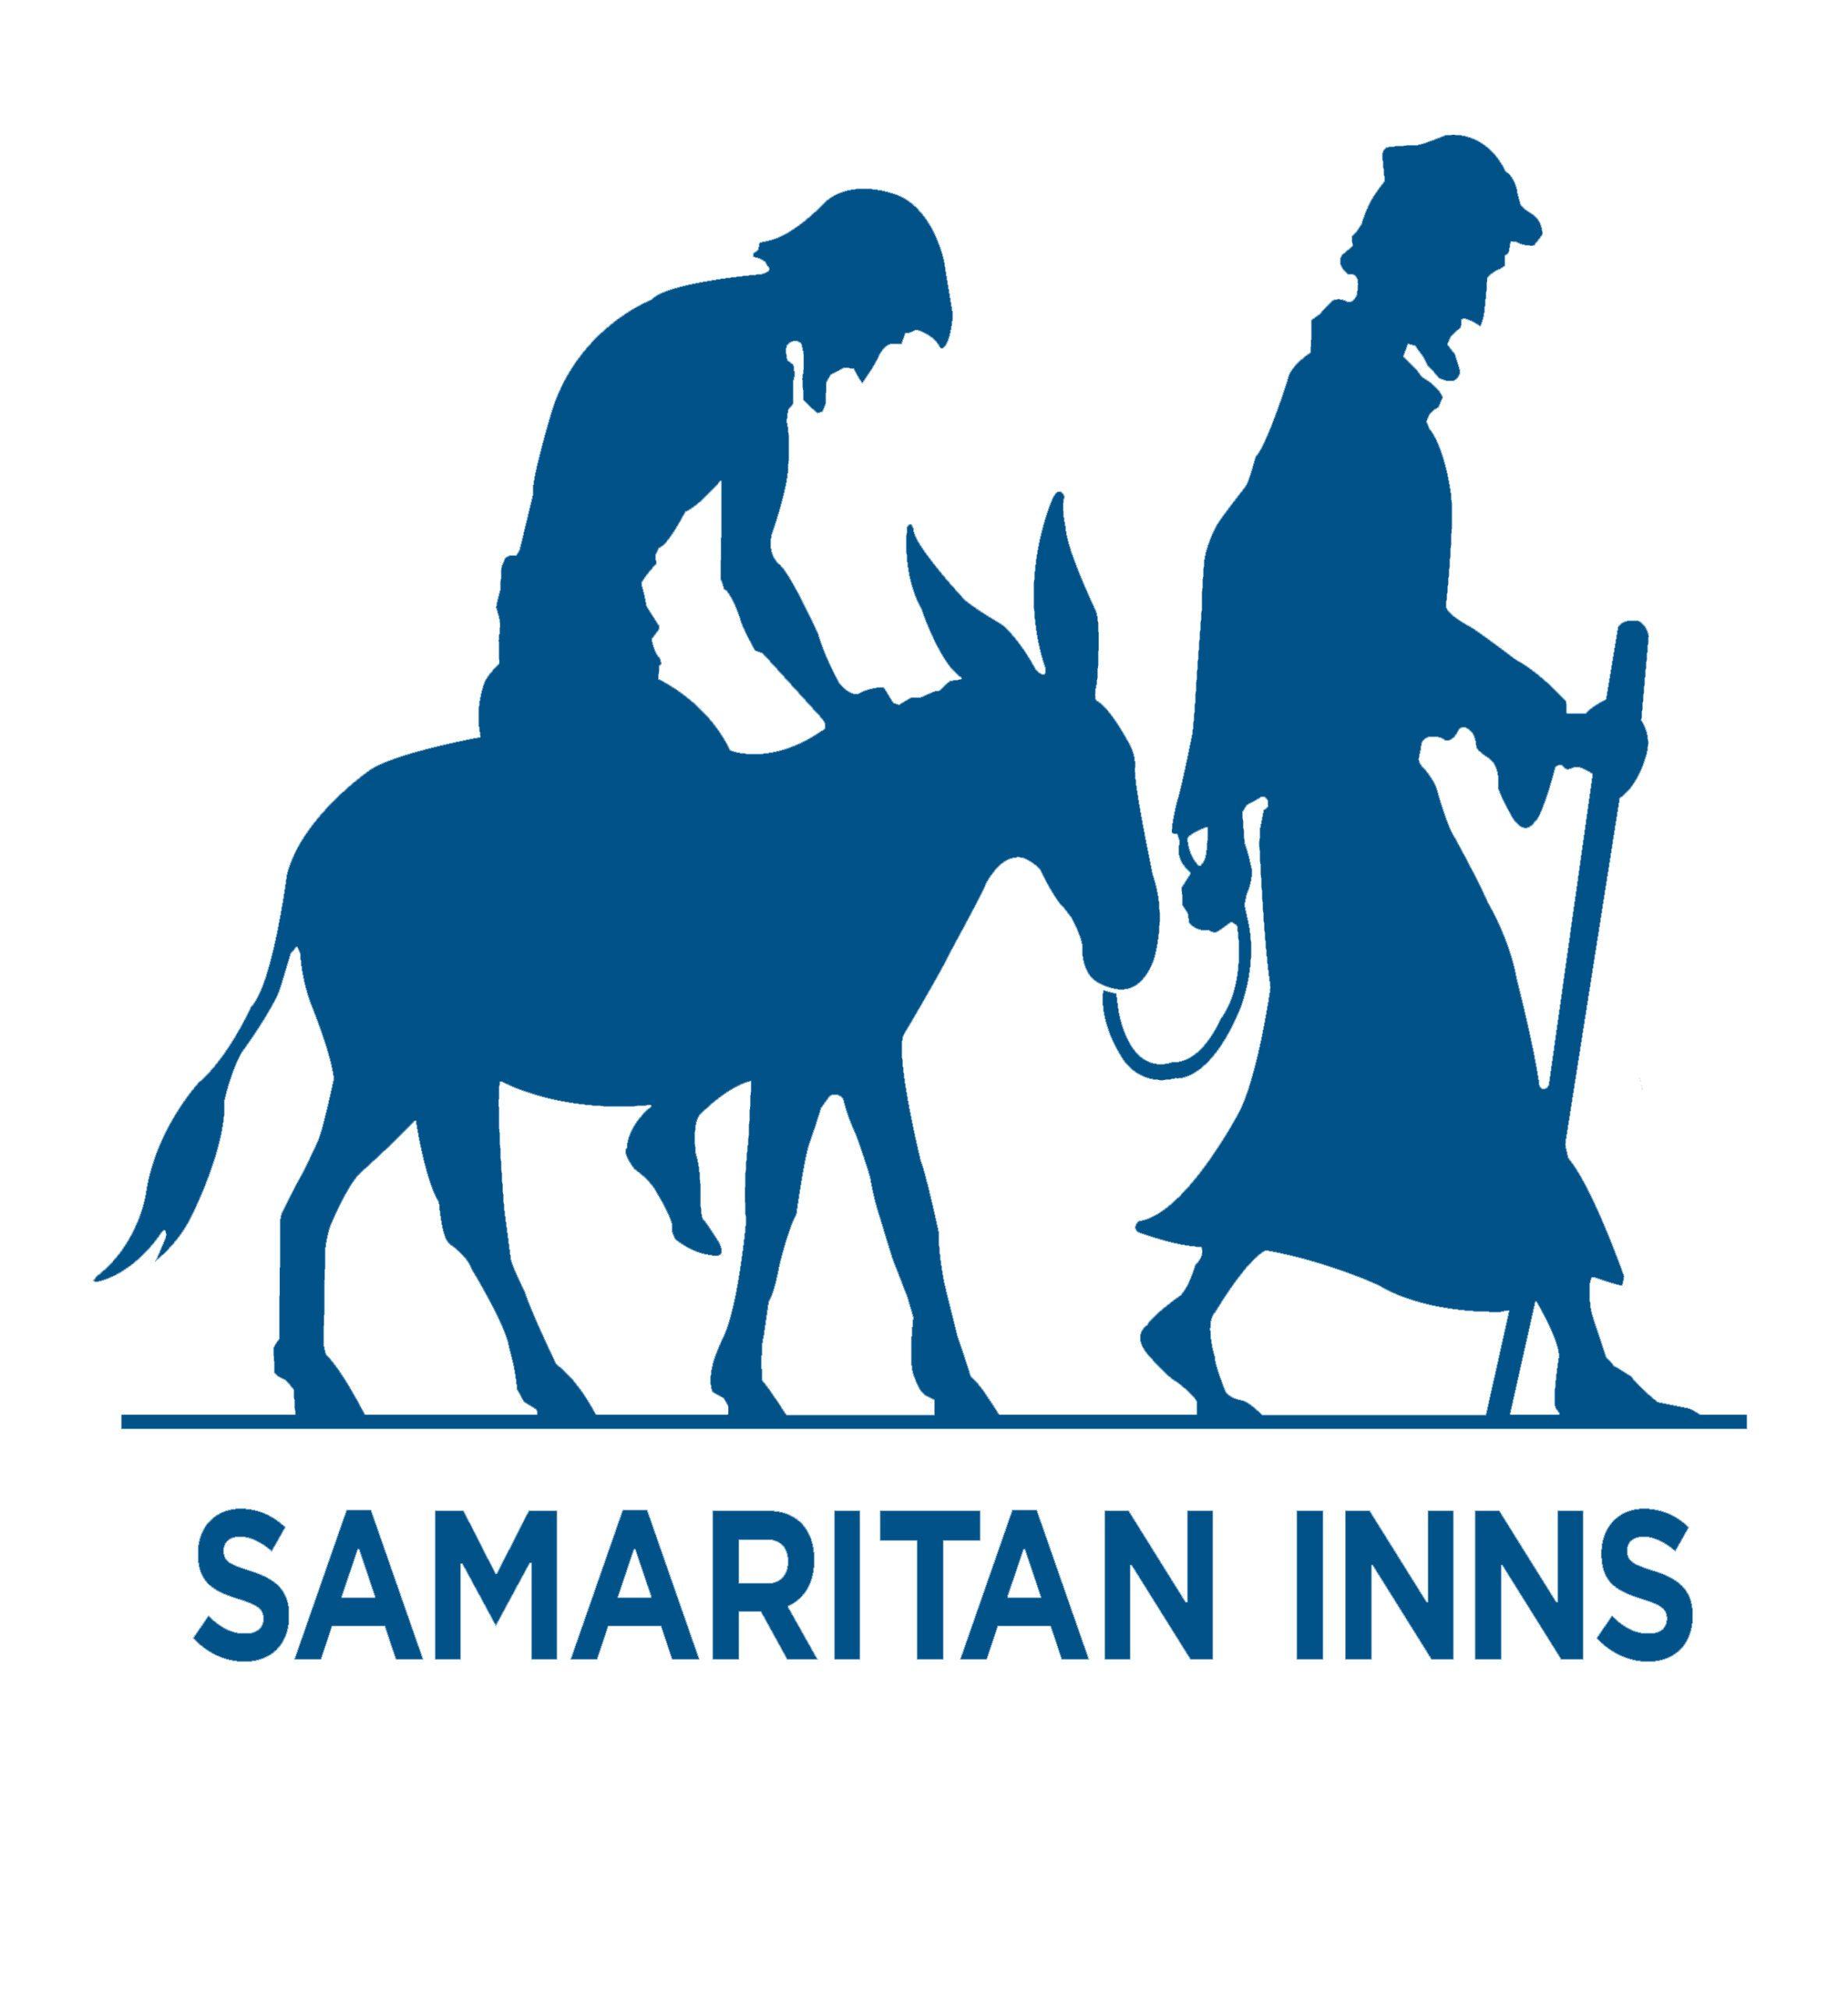 Samaritan Inns